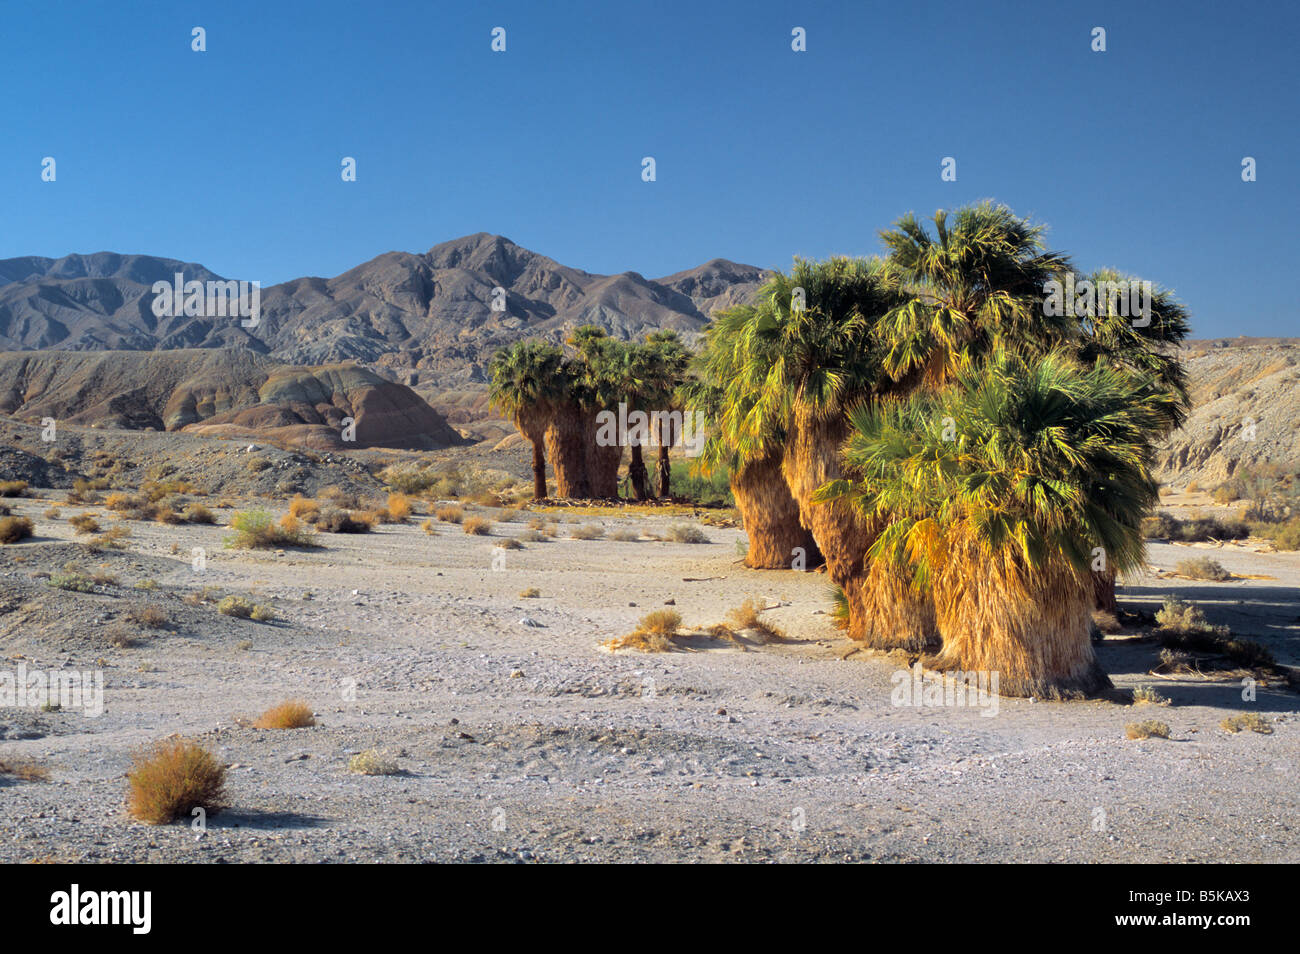 Wüste Fan Palmen an 17 Palms Oasis auf schneiden über Trail Feldweg in Kalifornien Anza Borrego Desert Stockbild